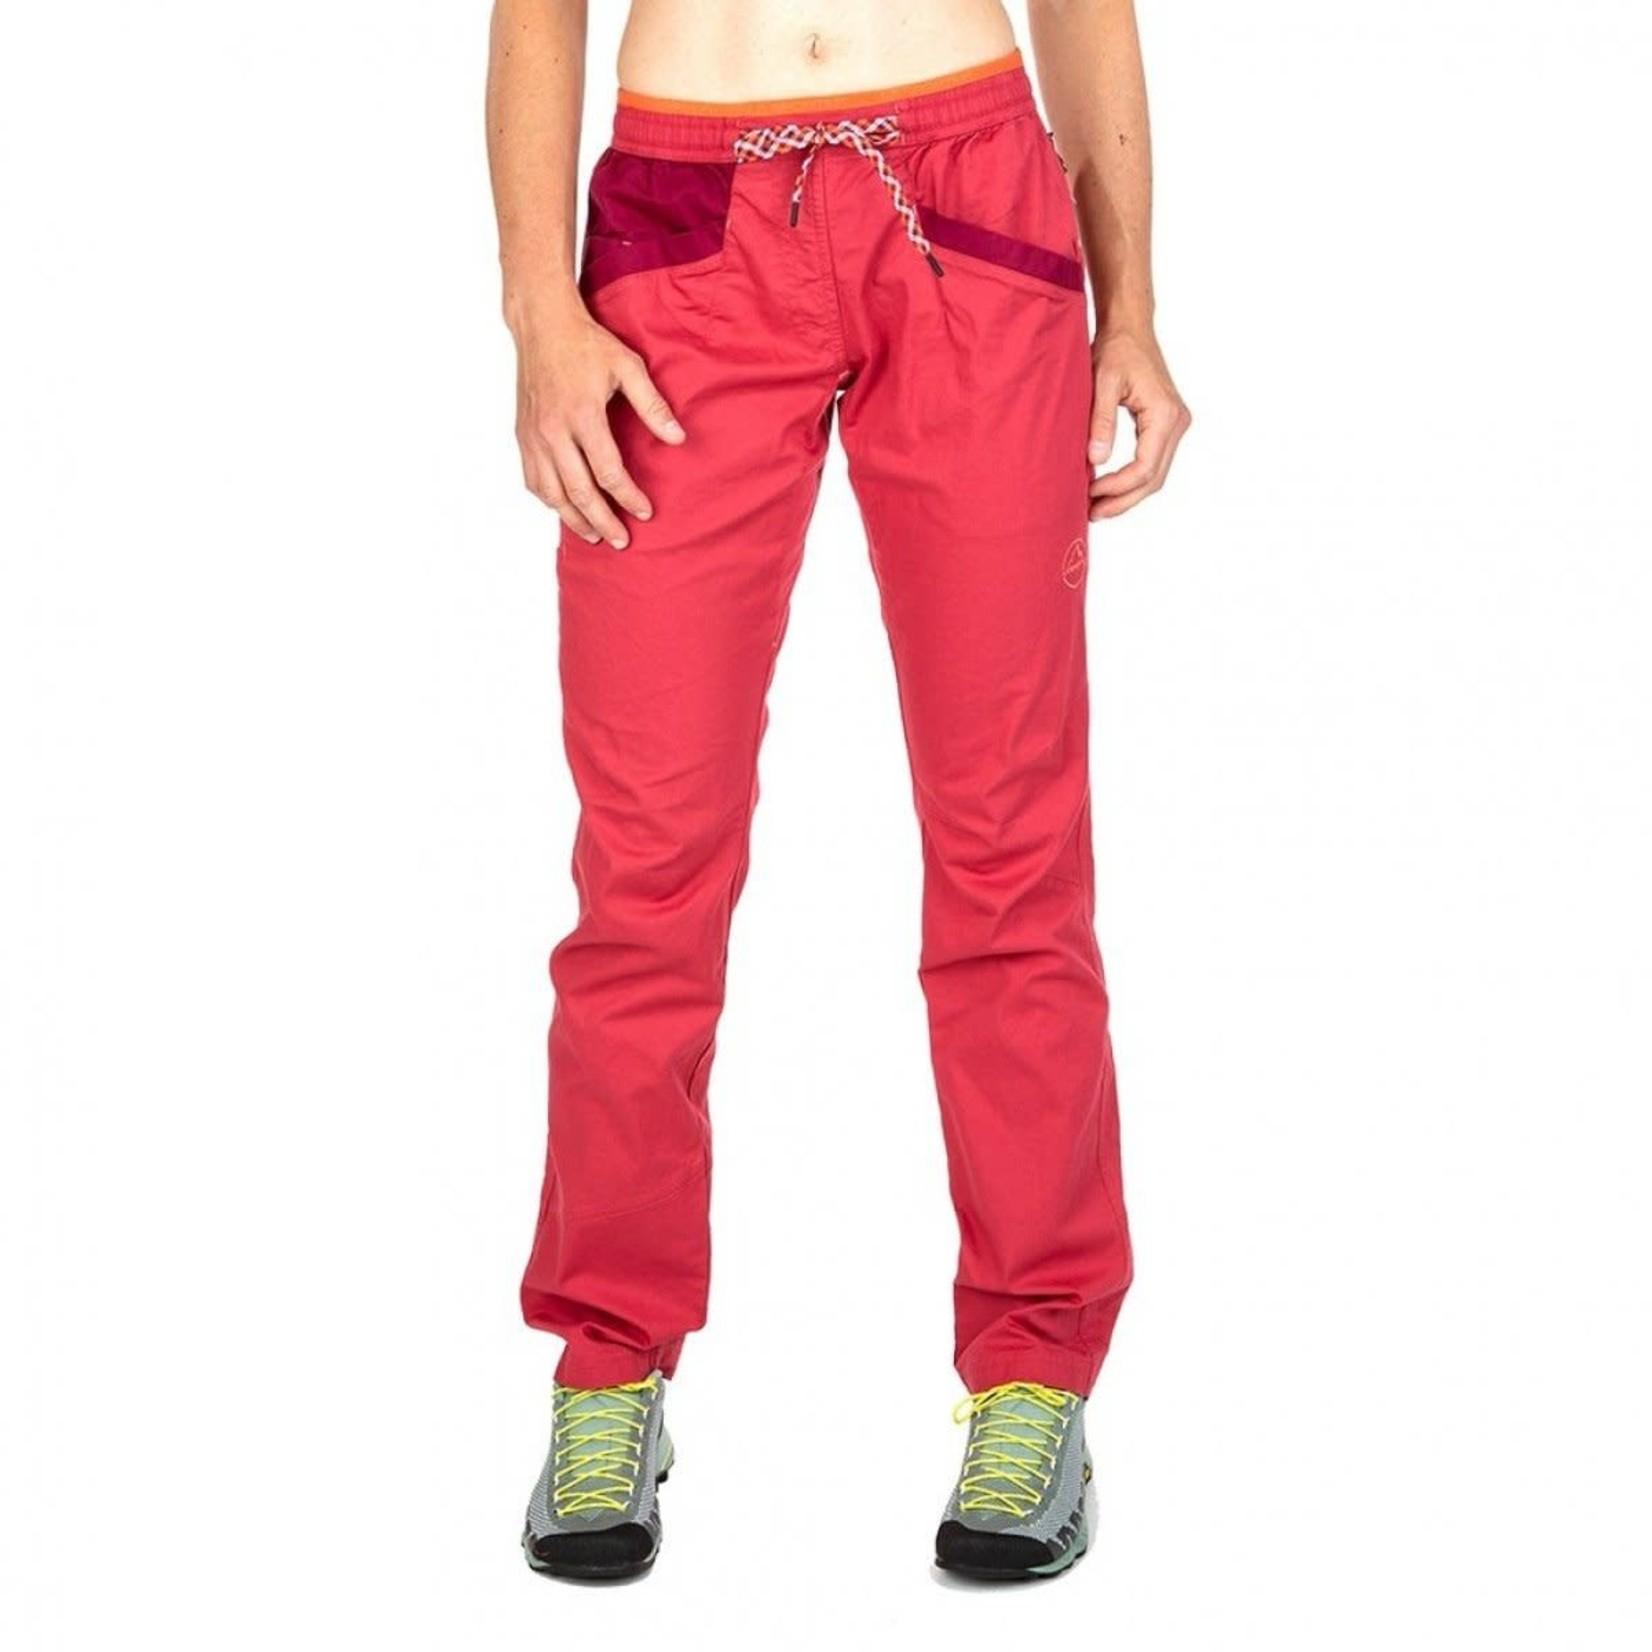 La Sportiva Pantalons La Sportiva Temple - Femmes